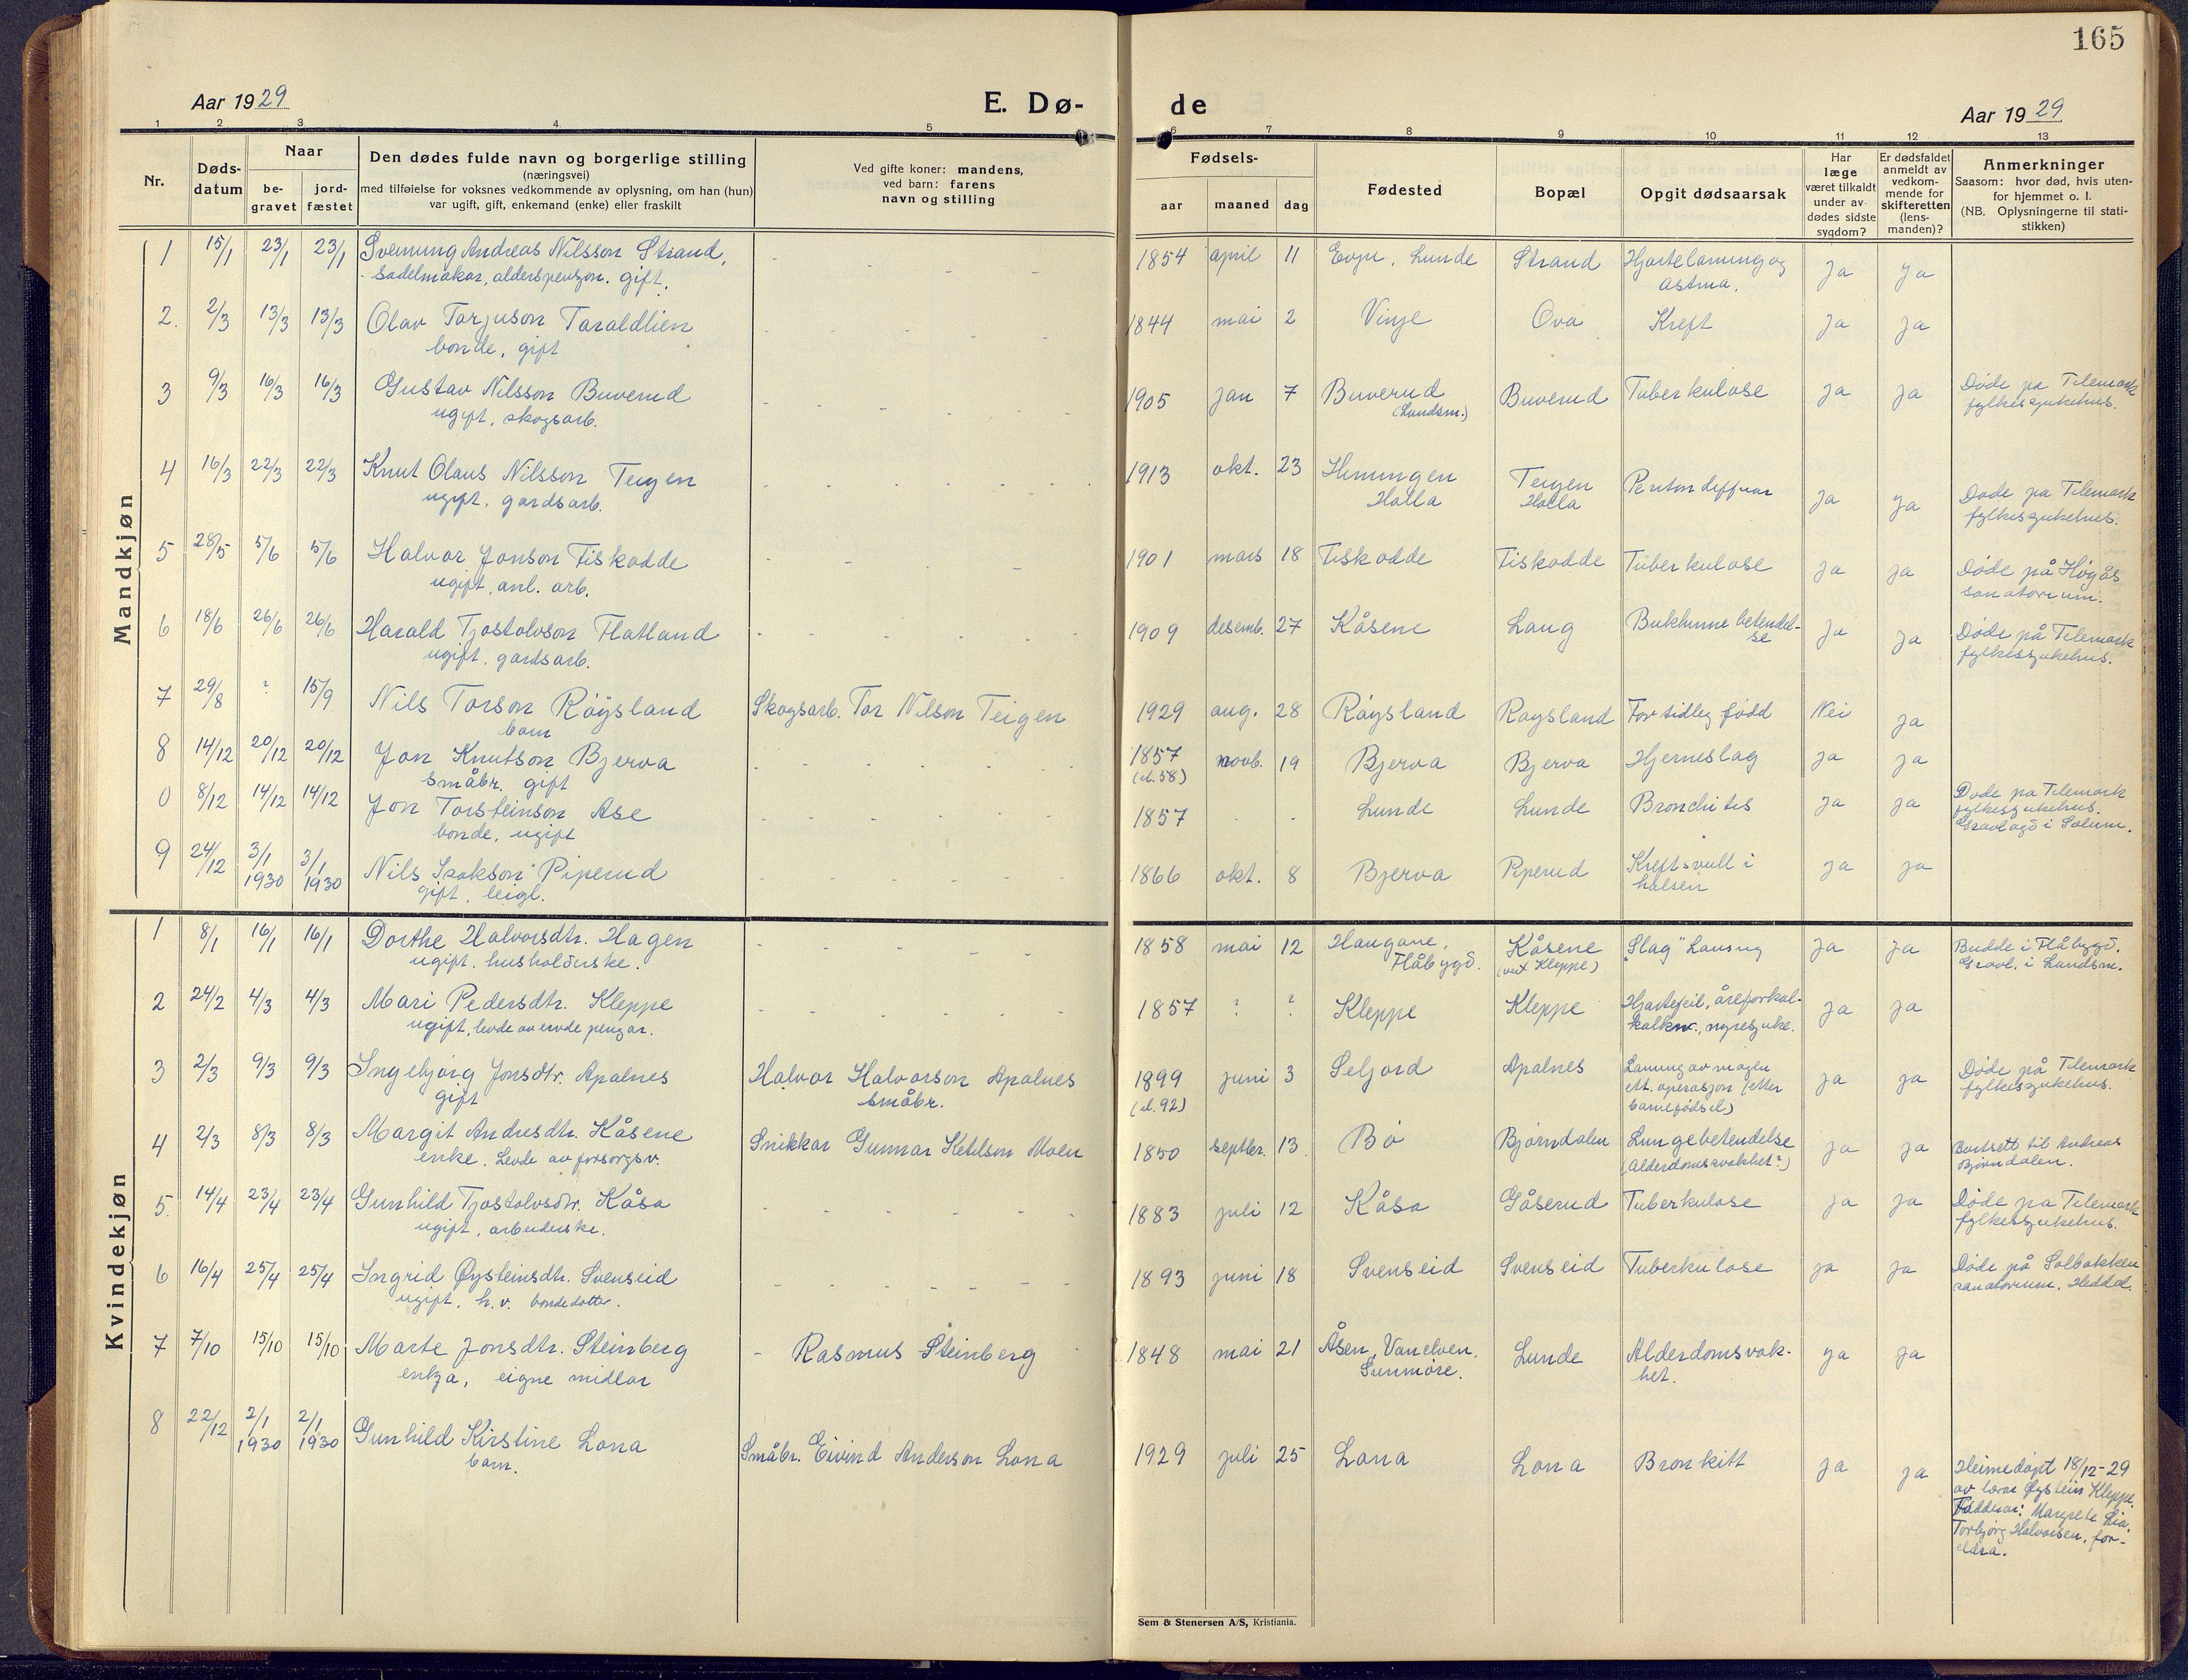 SAKO, Lunde kirkebøker, F/Fa/L0006: Ministerialbok nr. I 6, 1922-1940, s. 165